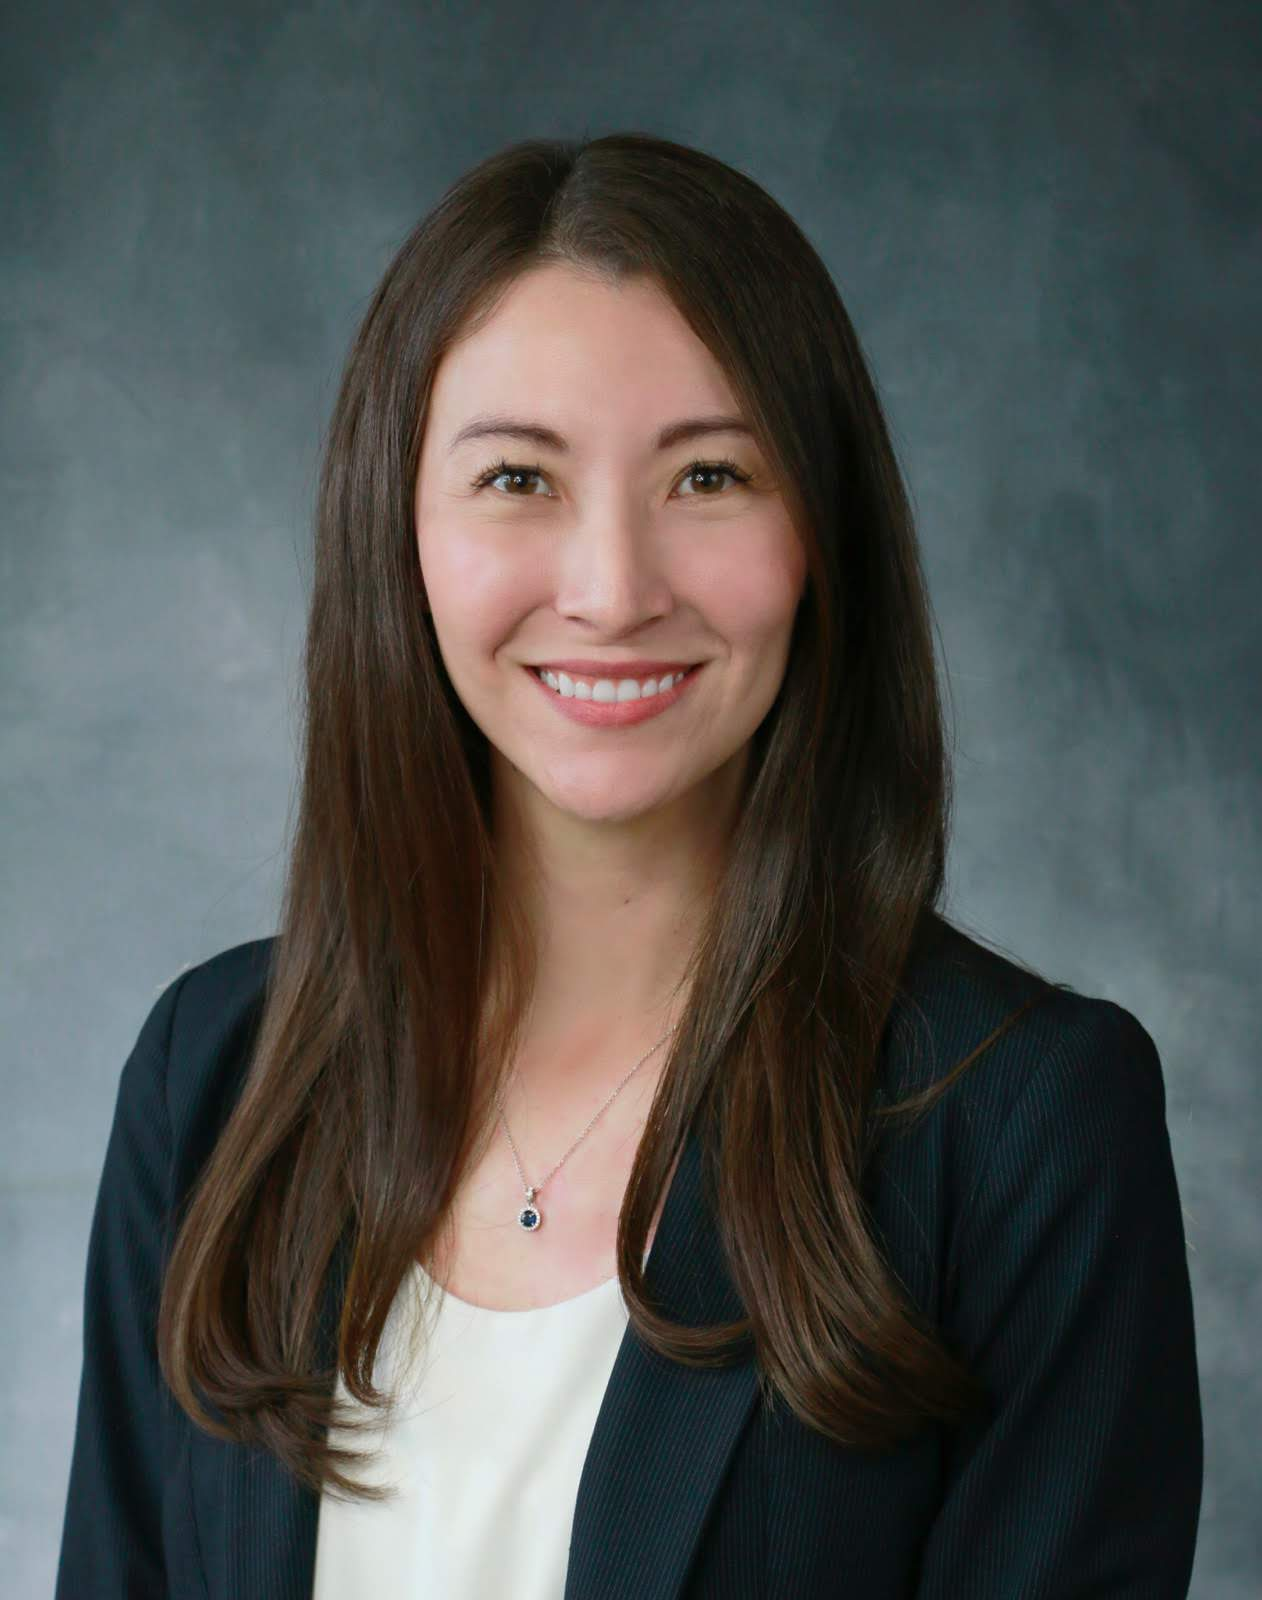 Dr. Katherine Price